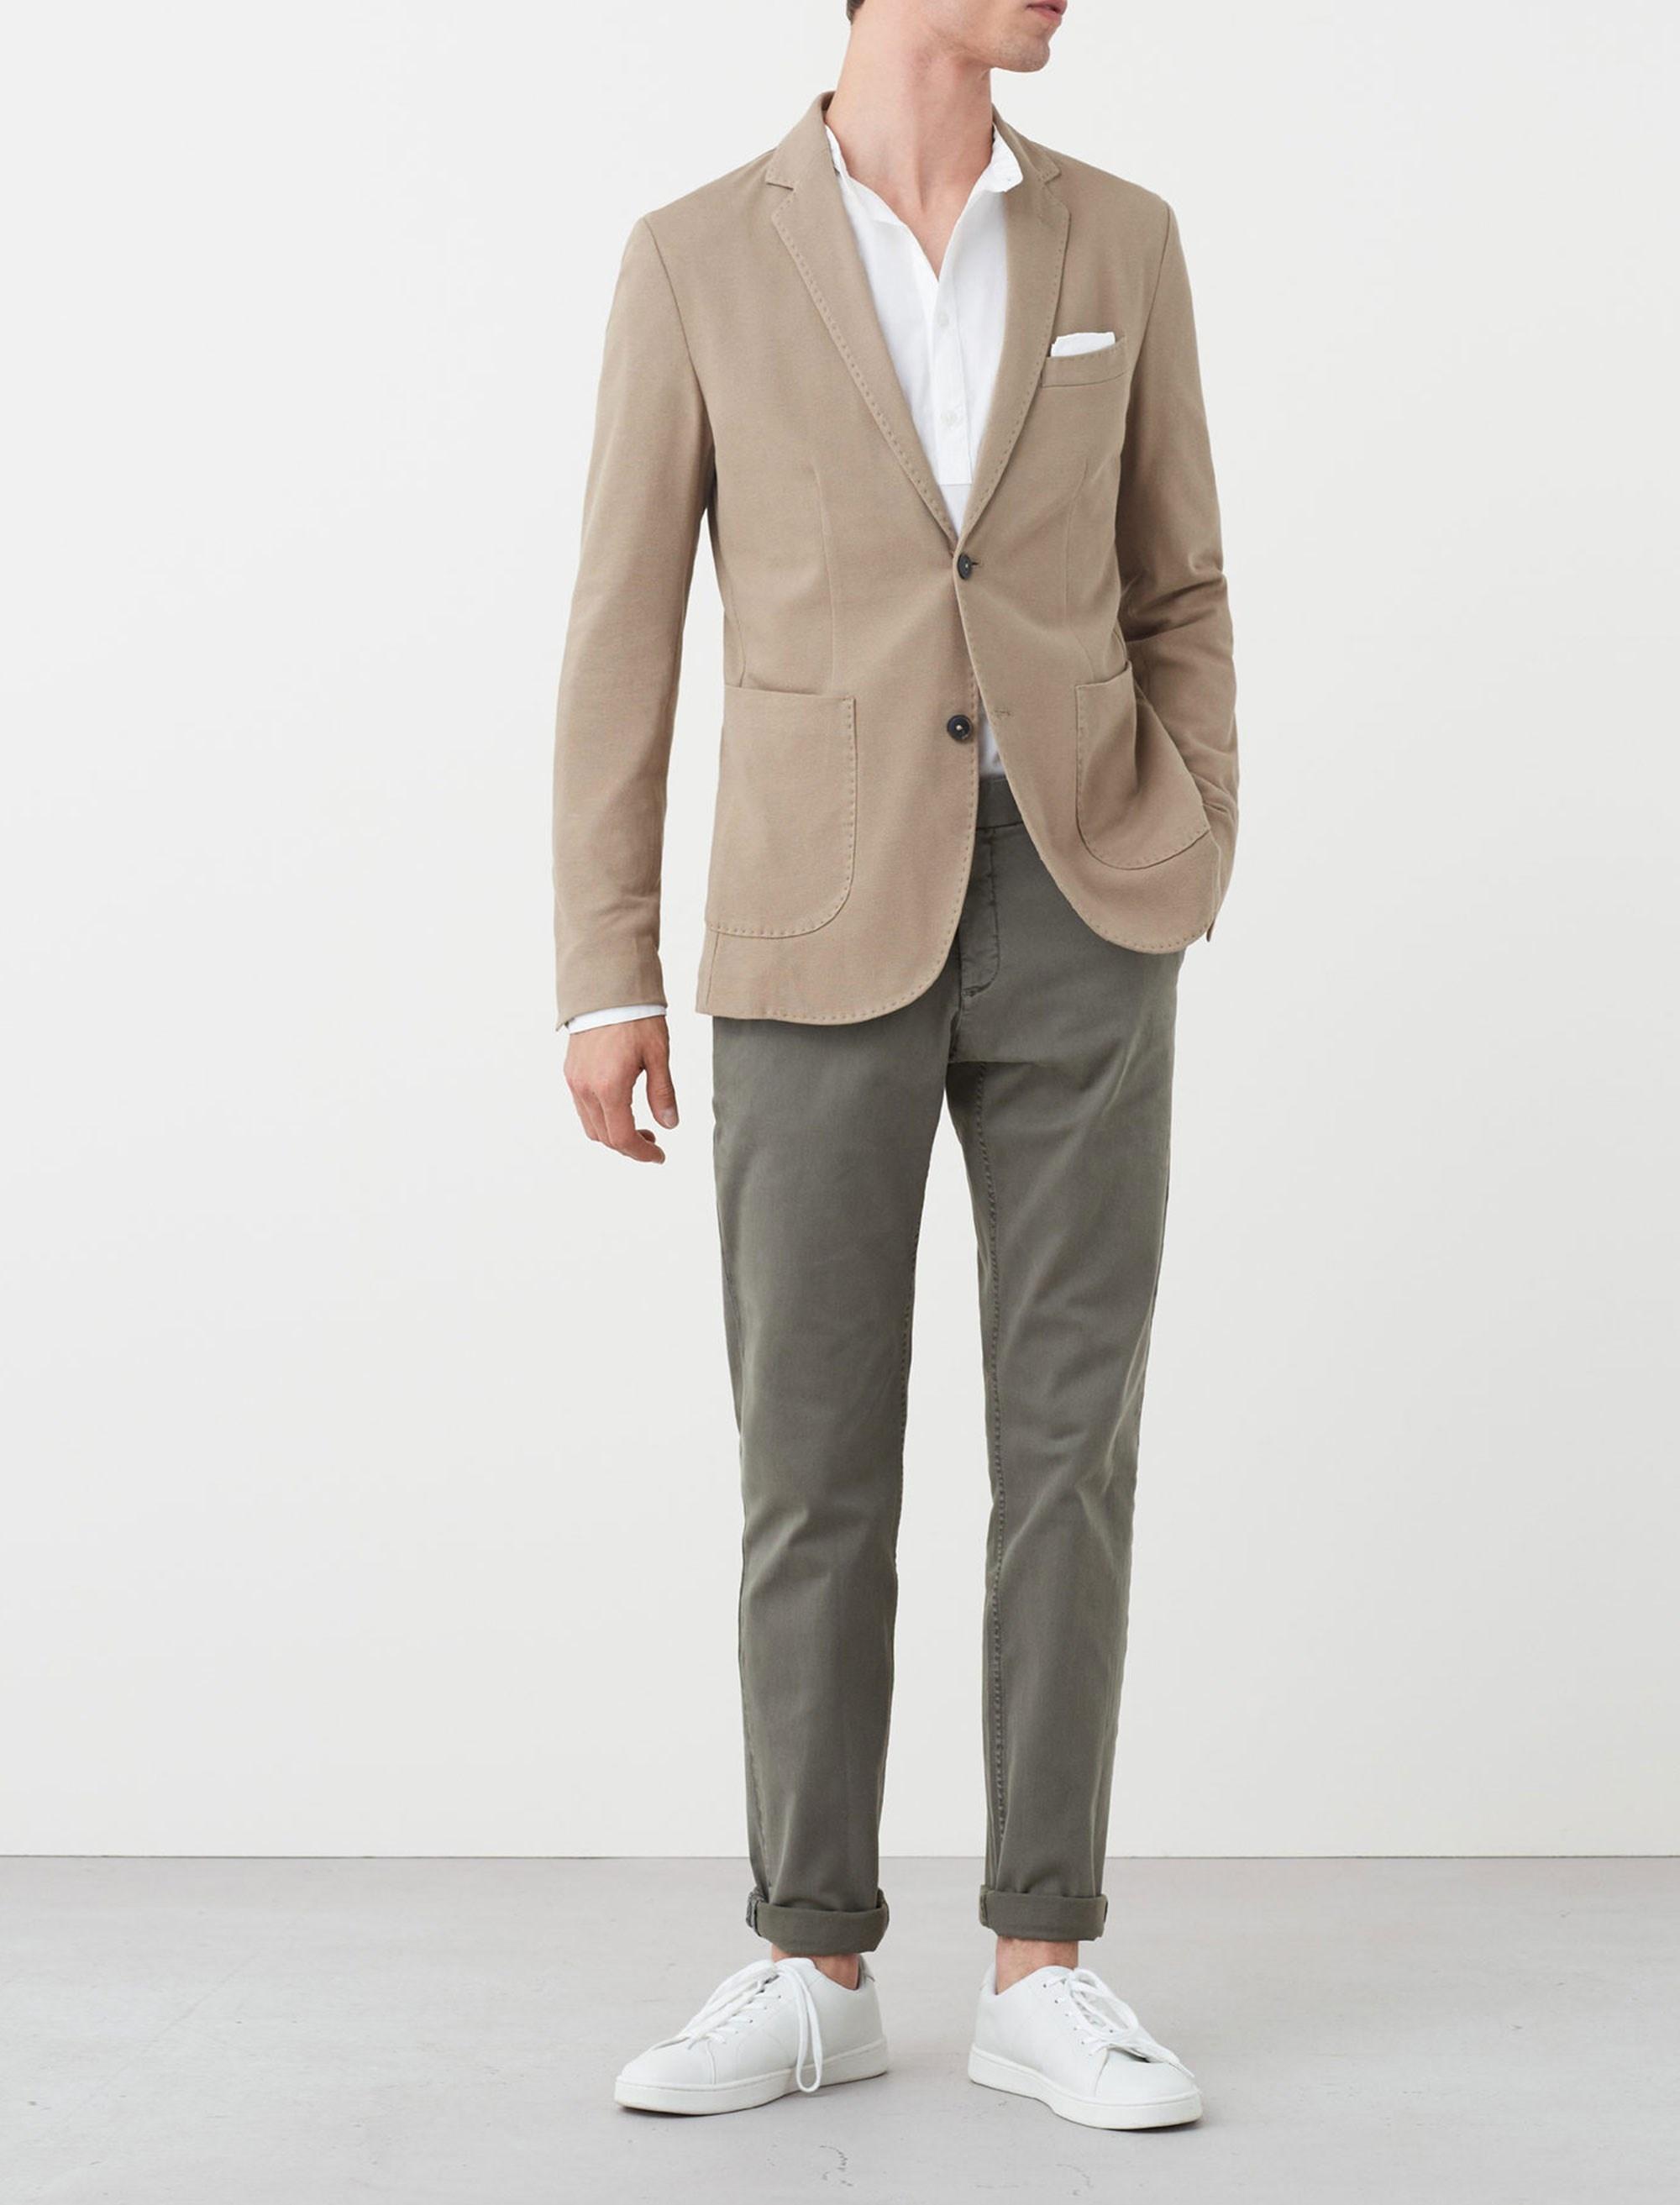 کت تک نخی مردانه - مانگو - بژ روشن - 2